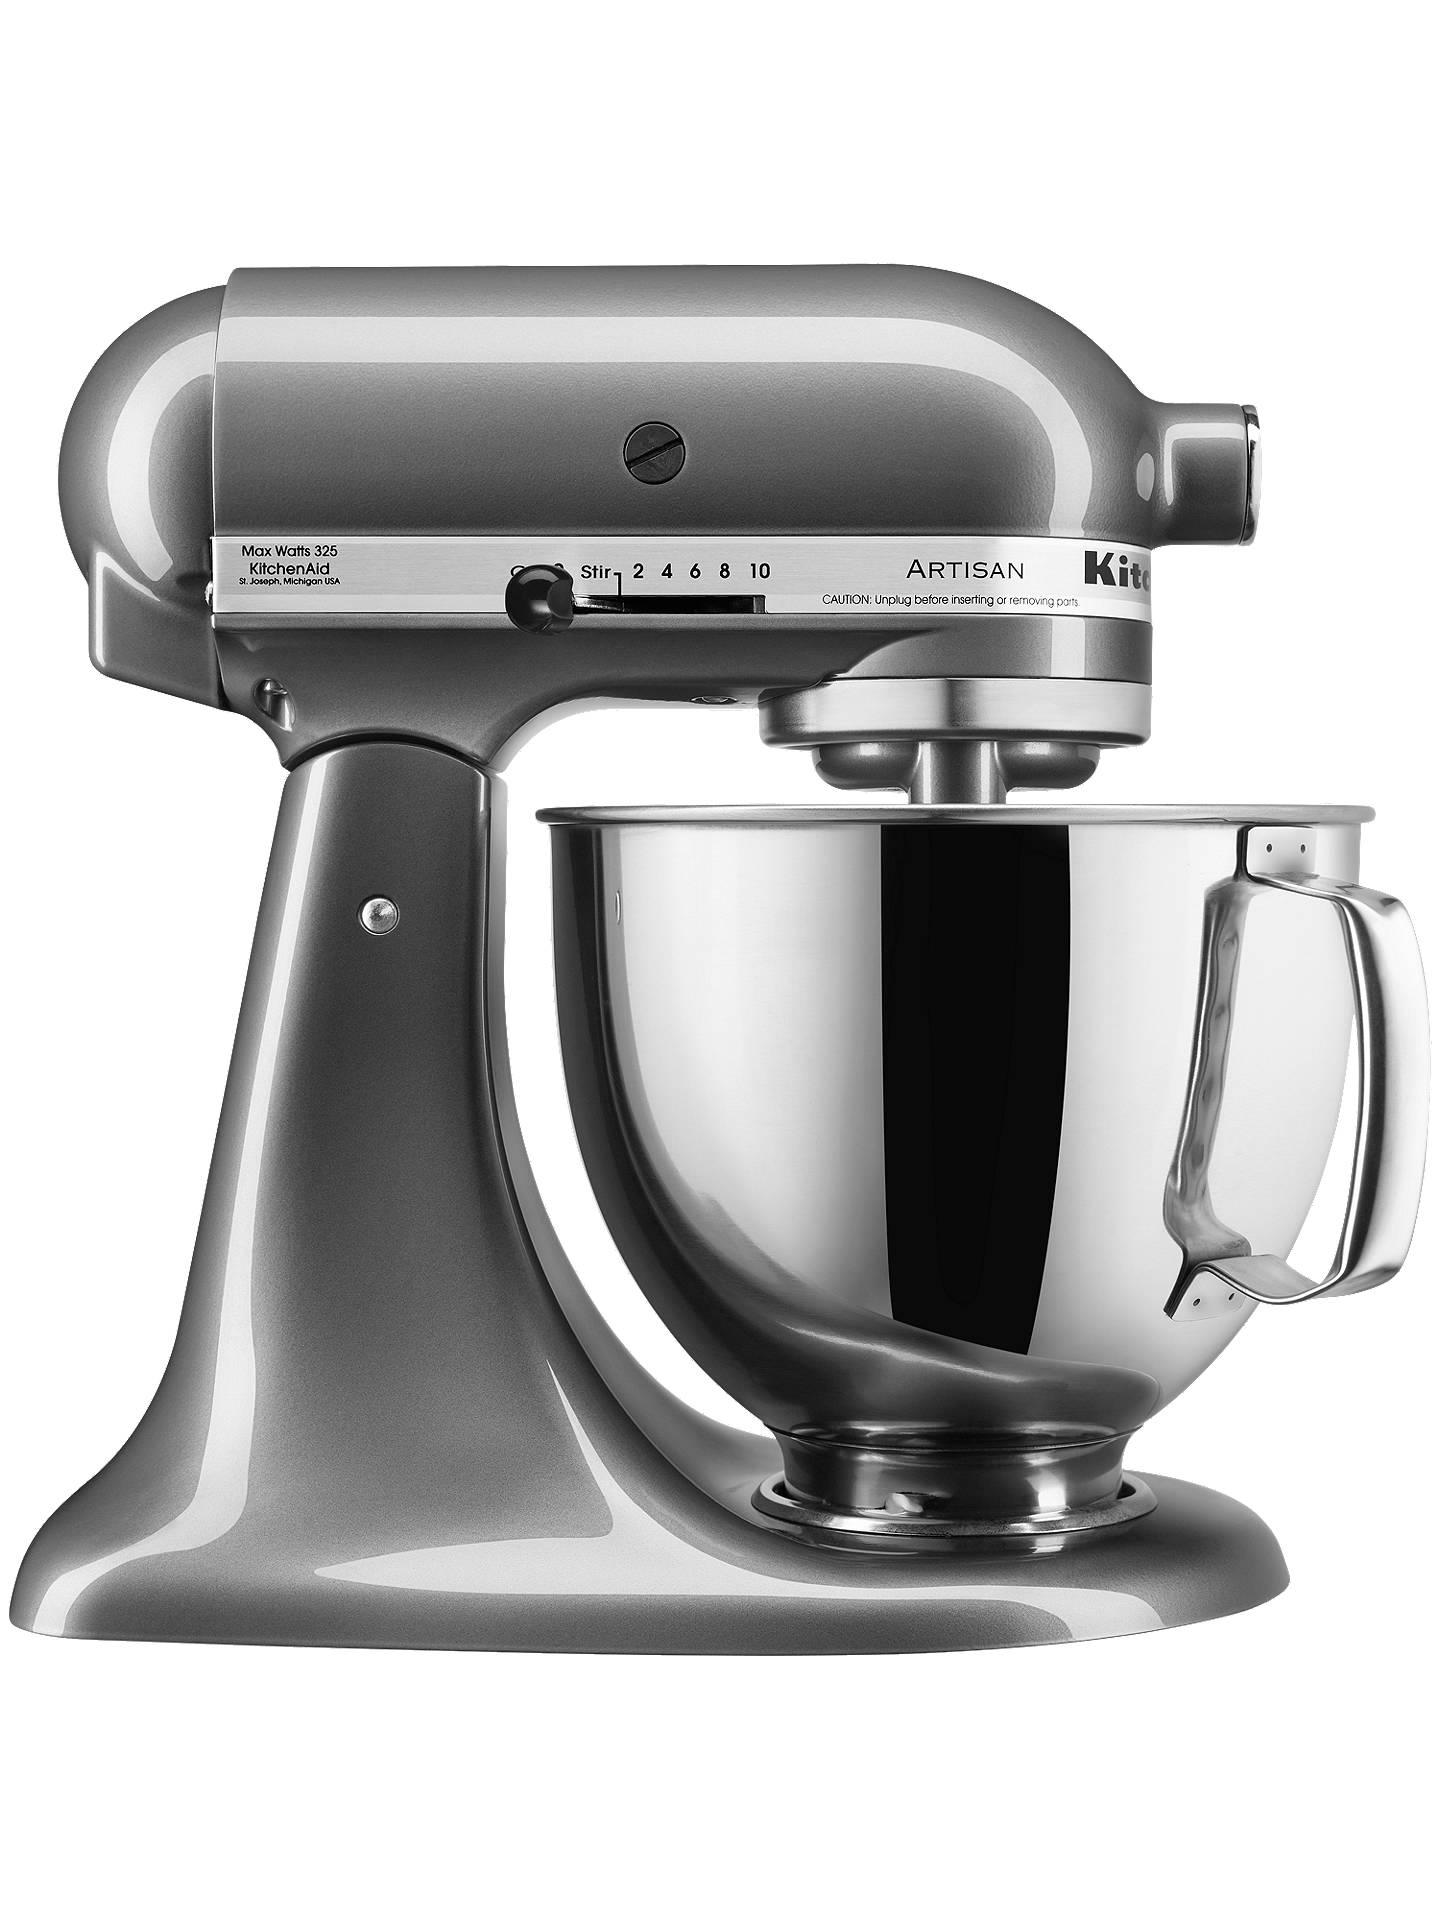 Kitchenaid 150 4 8l Stand Mixer Pearl Online At Johnlewis